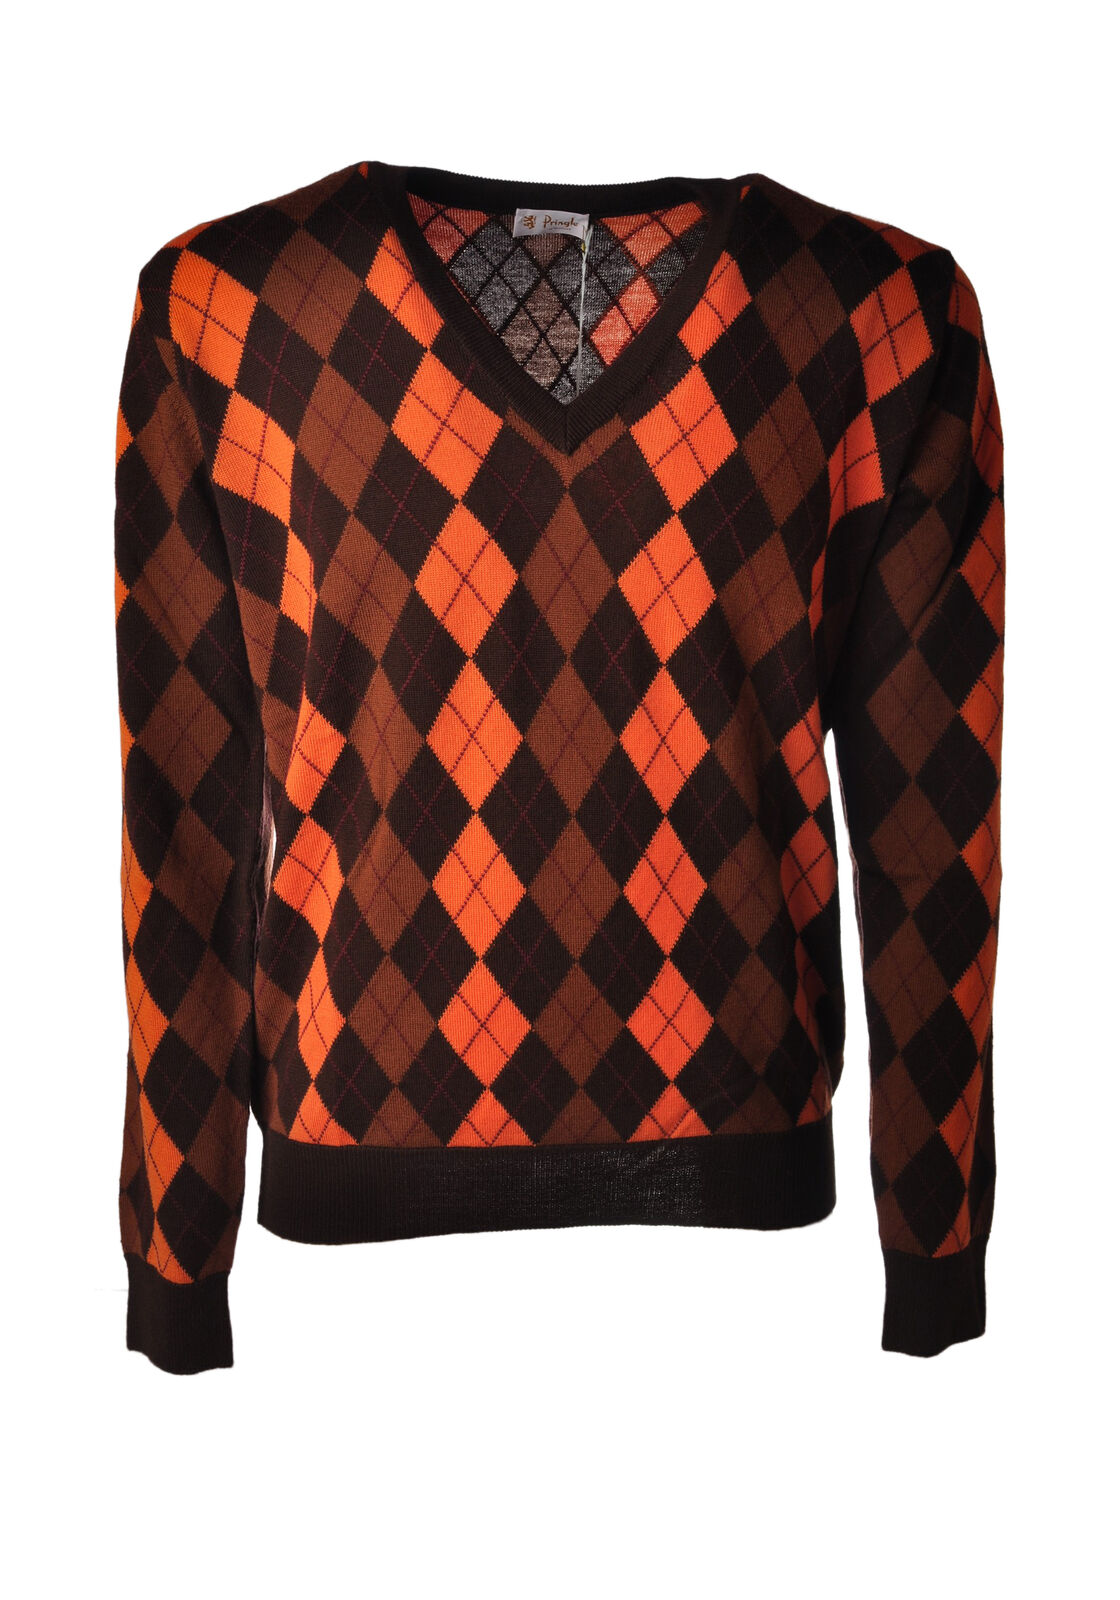 Pringle  -  Sweaters - Male - Fantasy - 4657321A185015